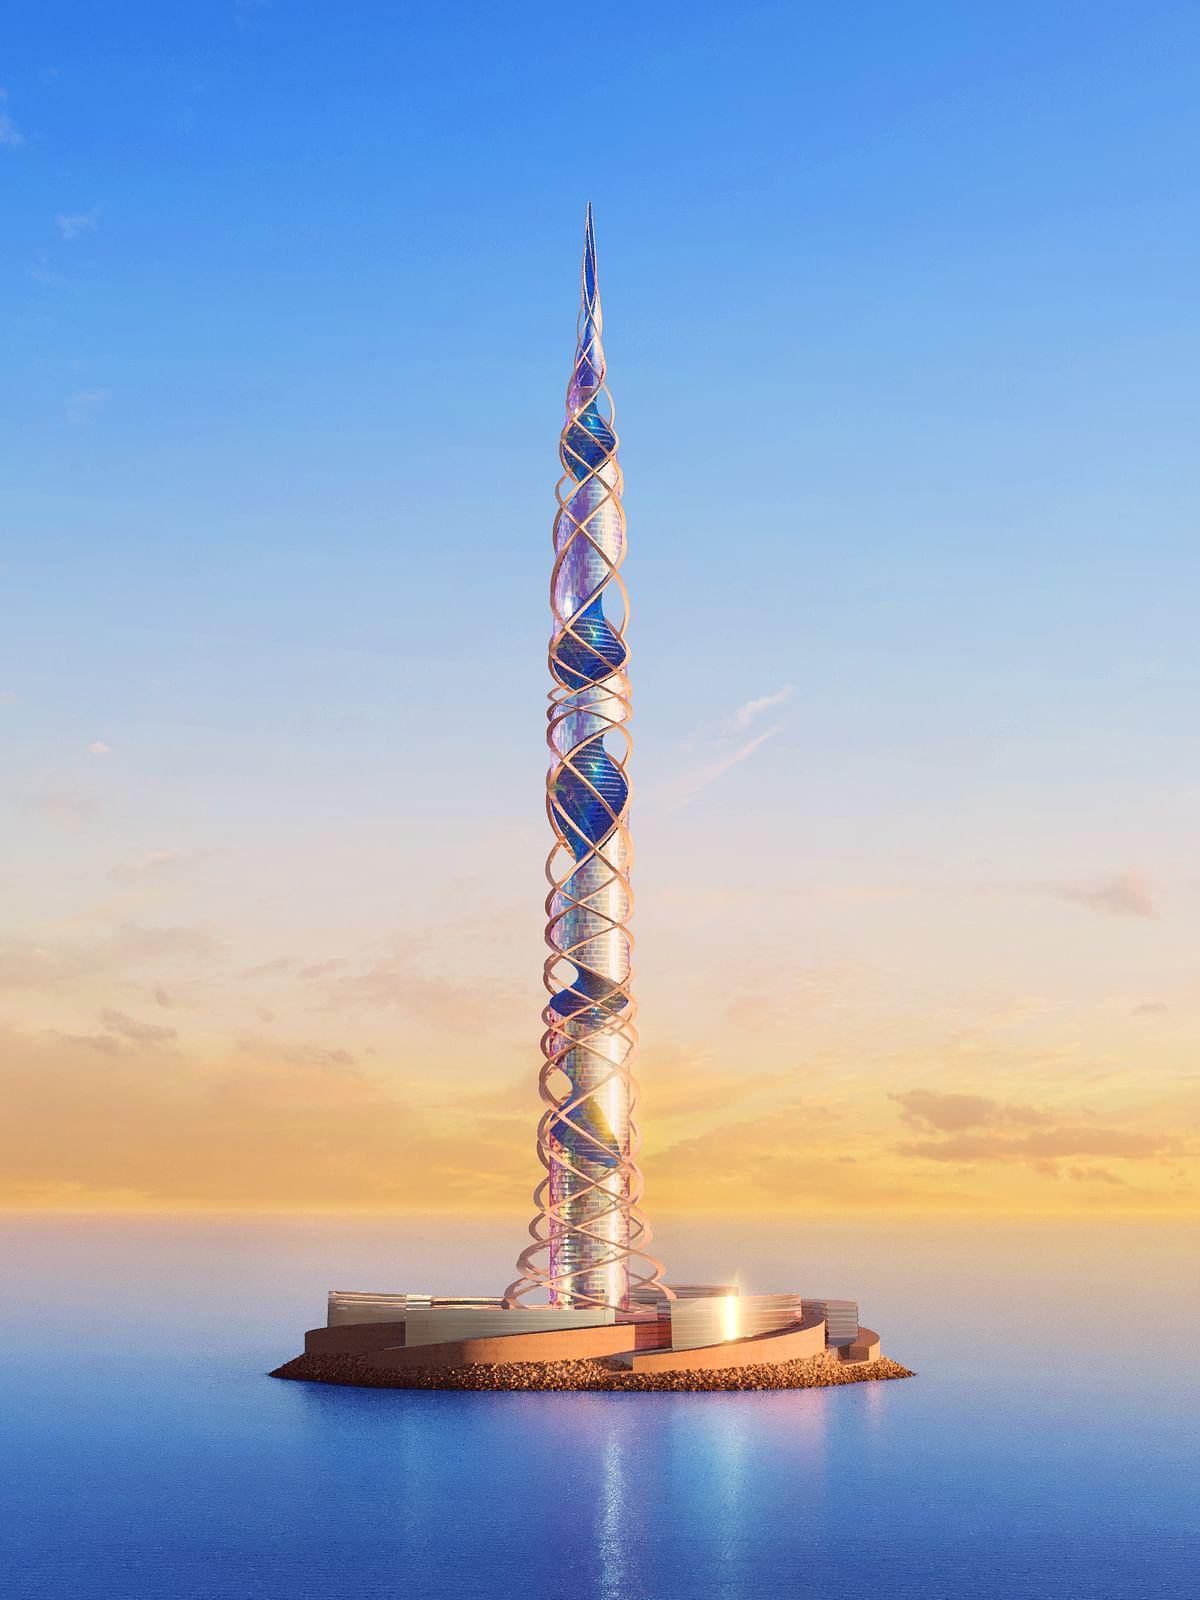 Architectural Concept Unveiled for Skyscraper Lakhta Center 2